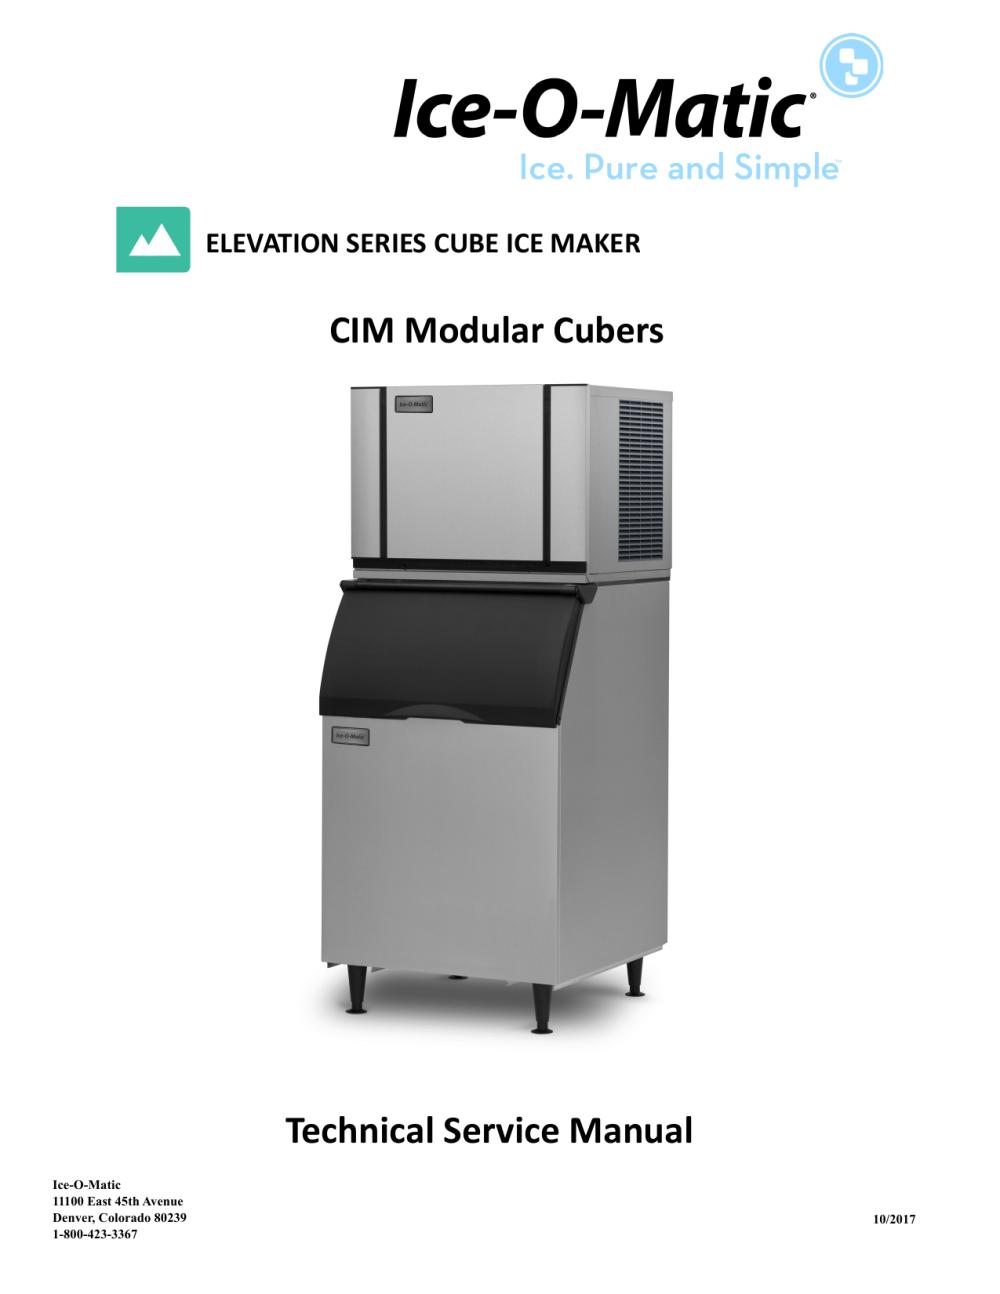 medium resolution of cim technical manual 10 5 2017 book ice o